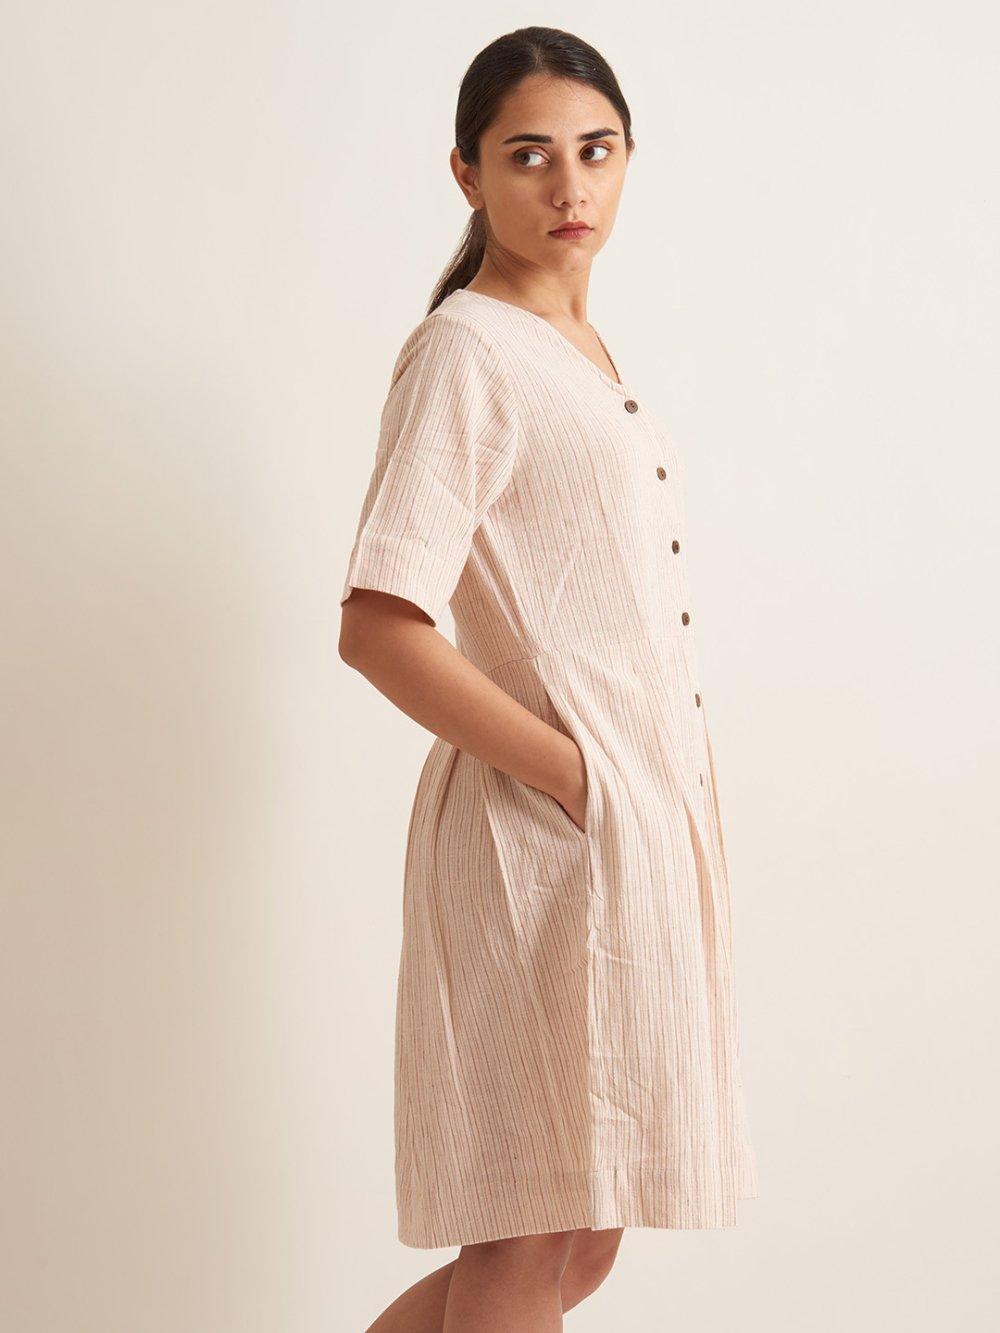 Organic Clothing Linen Fashion